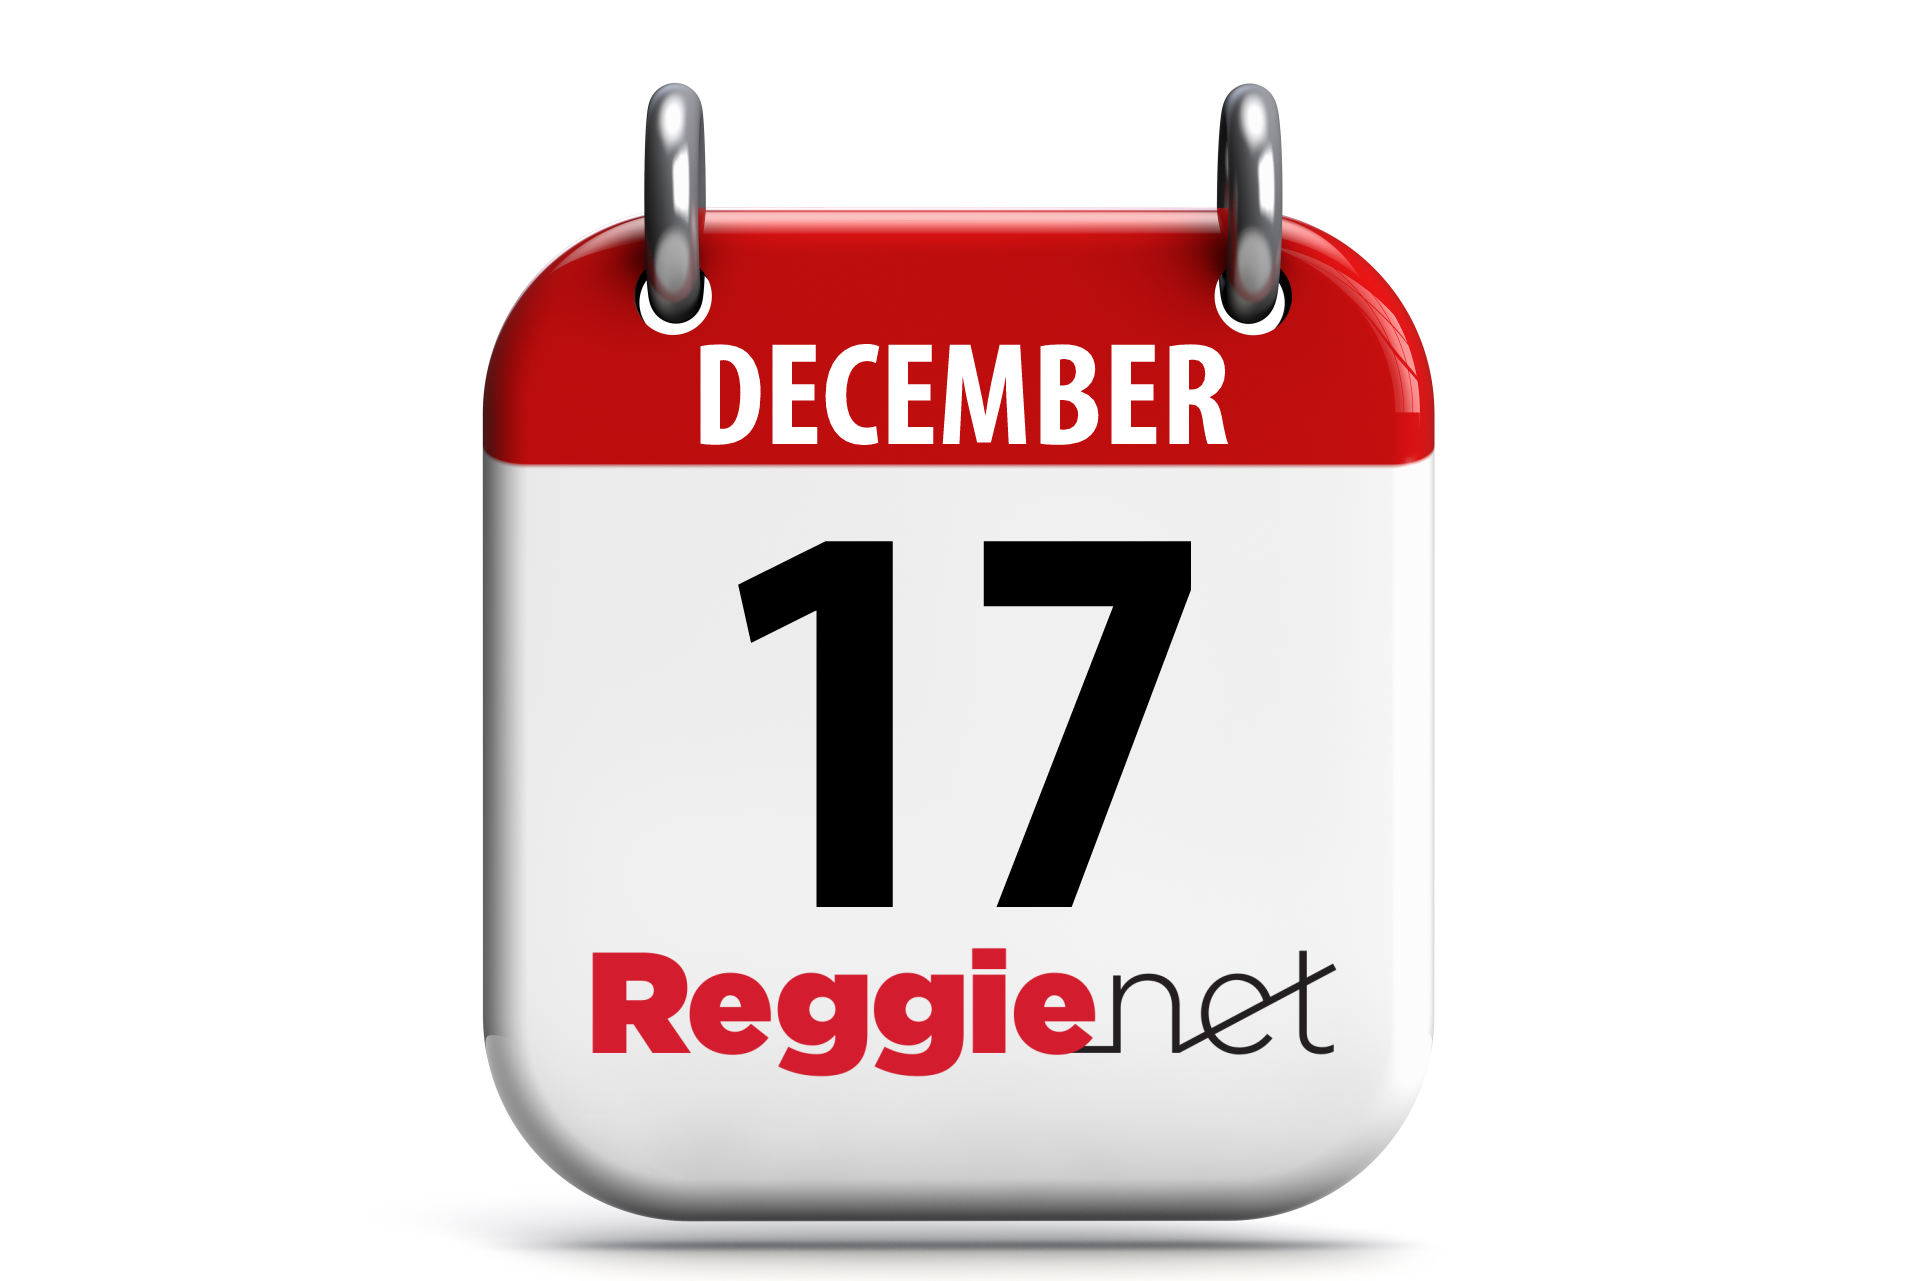 Calendar showing December 17 and ReggieNet logo.